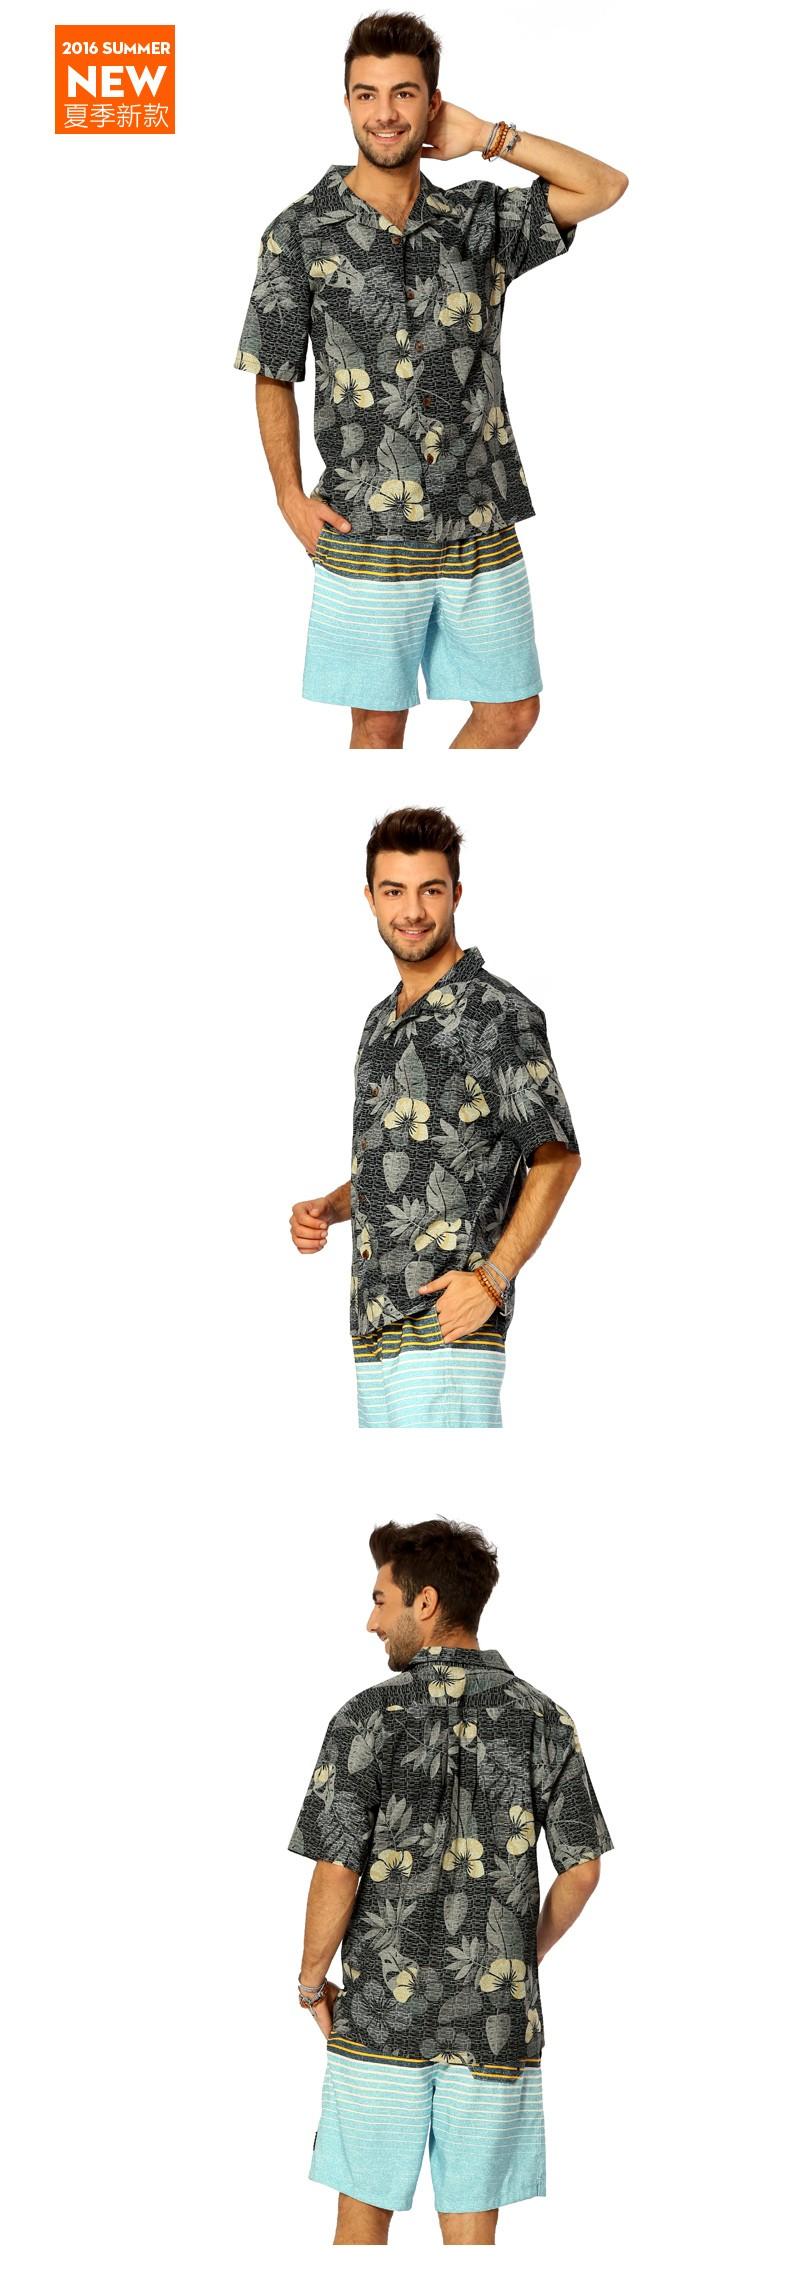 HTB1APsBKVXXXXbFapXXq6xXFXXXG - 2016 Hawaii Shirts Men's Casual Short Sleeve Printed Home Shirt Plus size Mens Cotton Hawaiian Shirt Camisa Hawaiana A1395